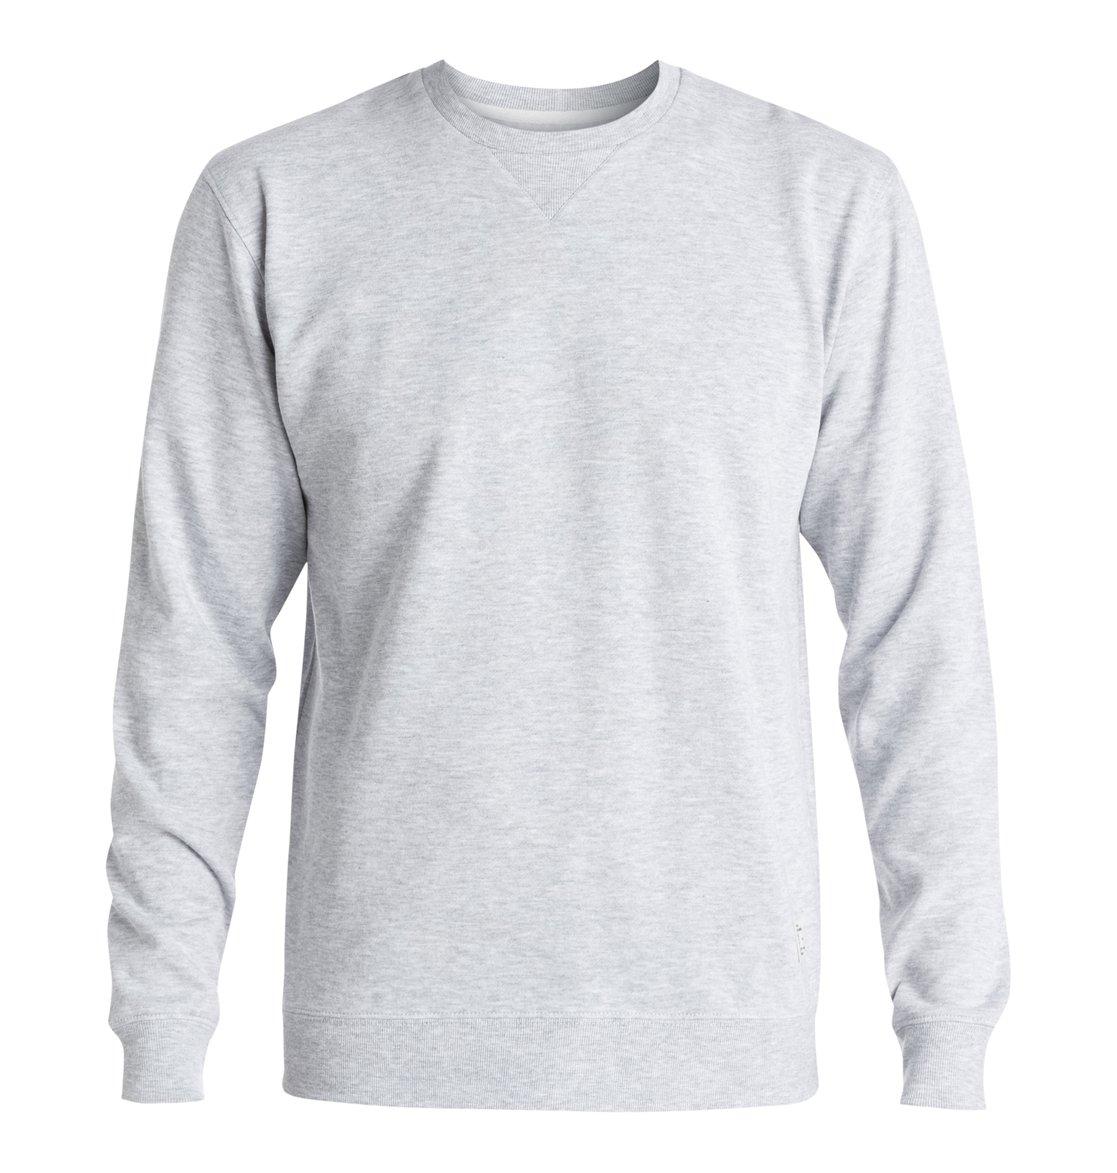 Rebel Sweatshirt